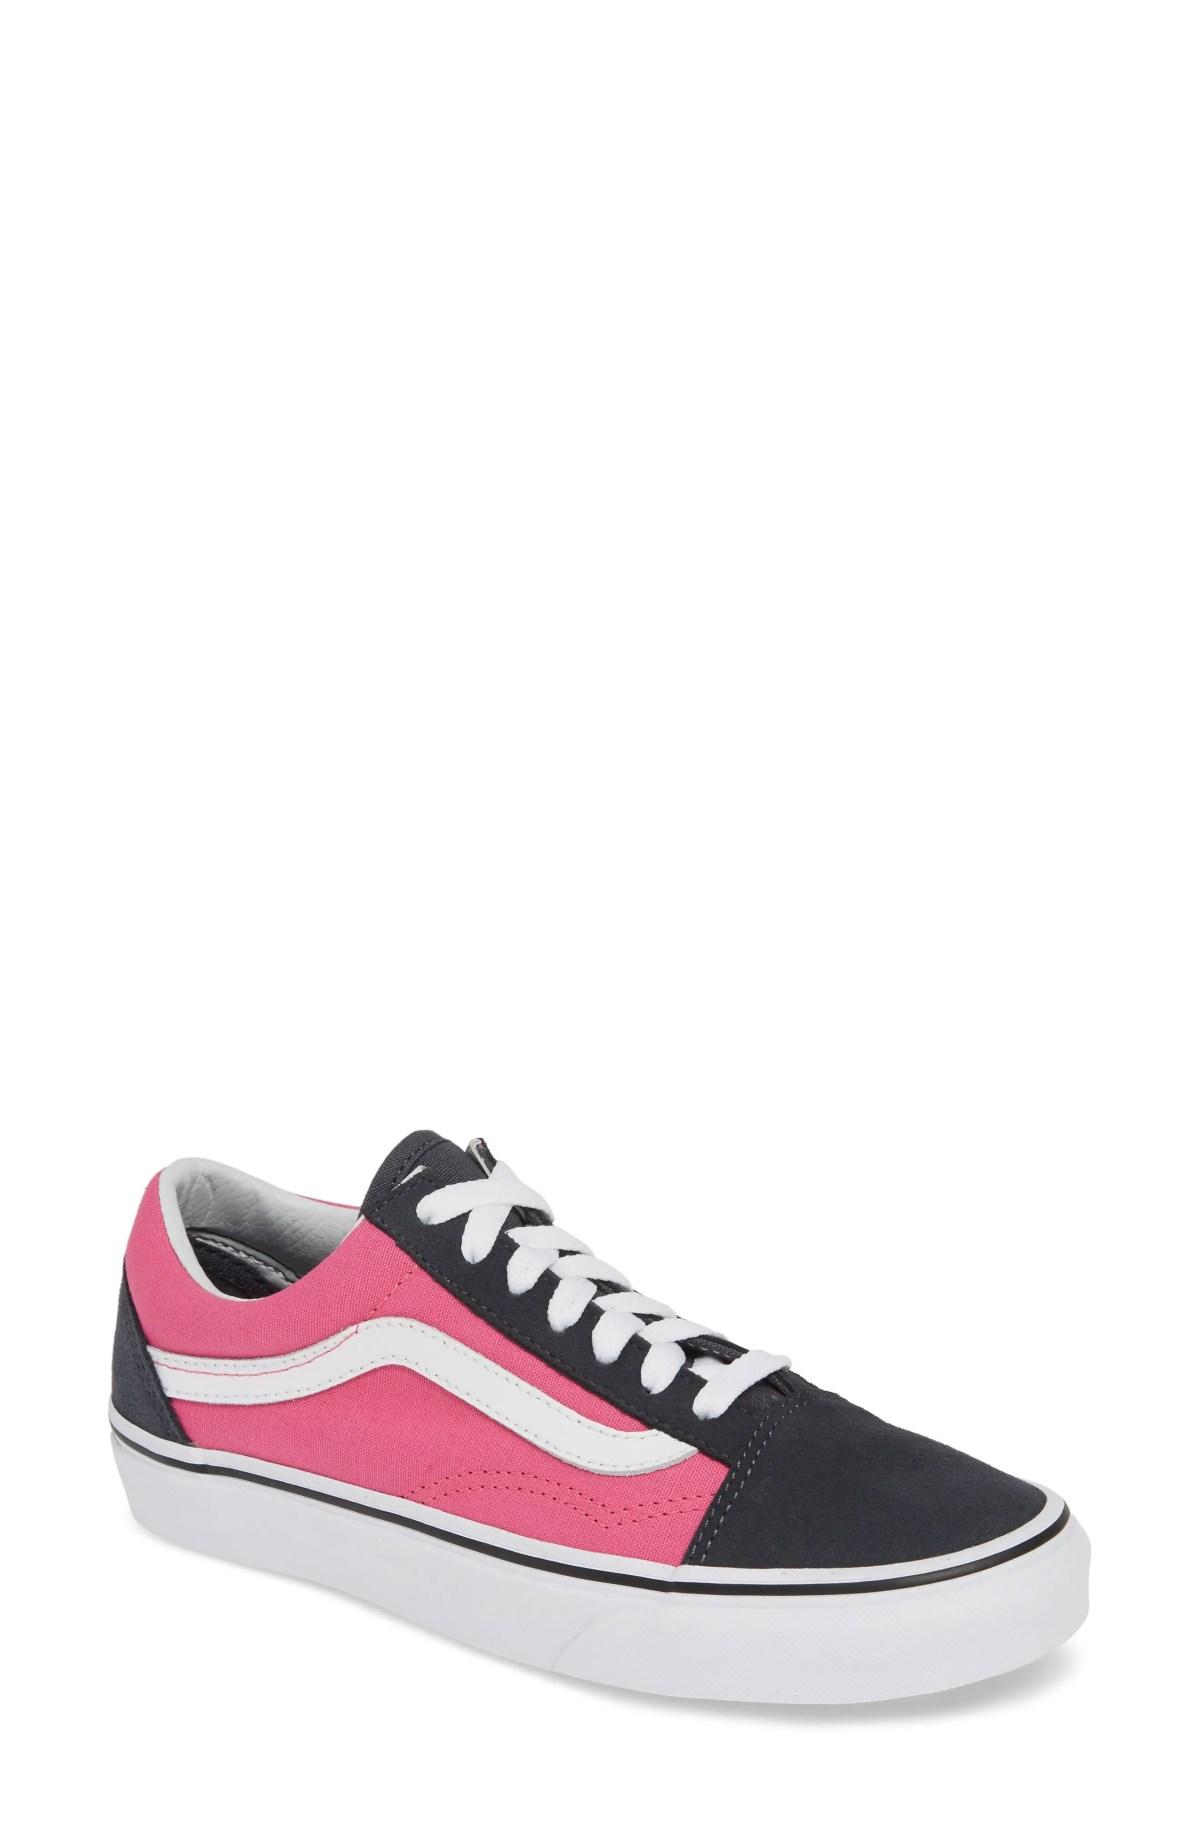 VANS Old Skool Sneaker, Main, color, 2-TONE EBONY/ CARMINE ROSE